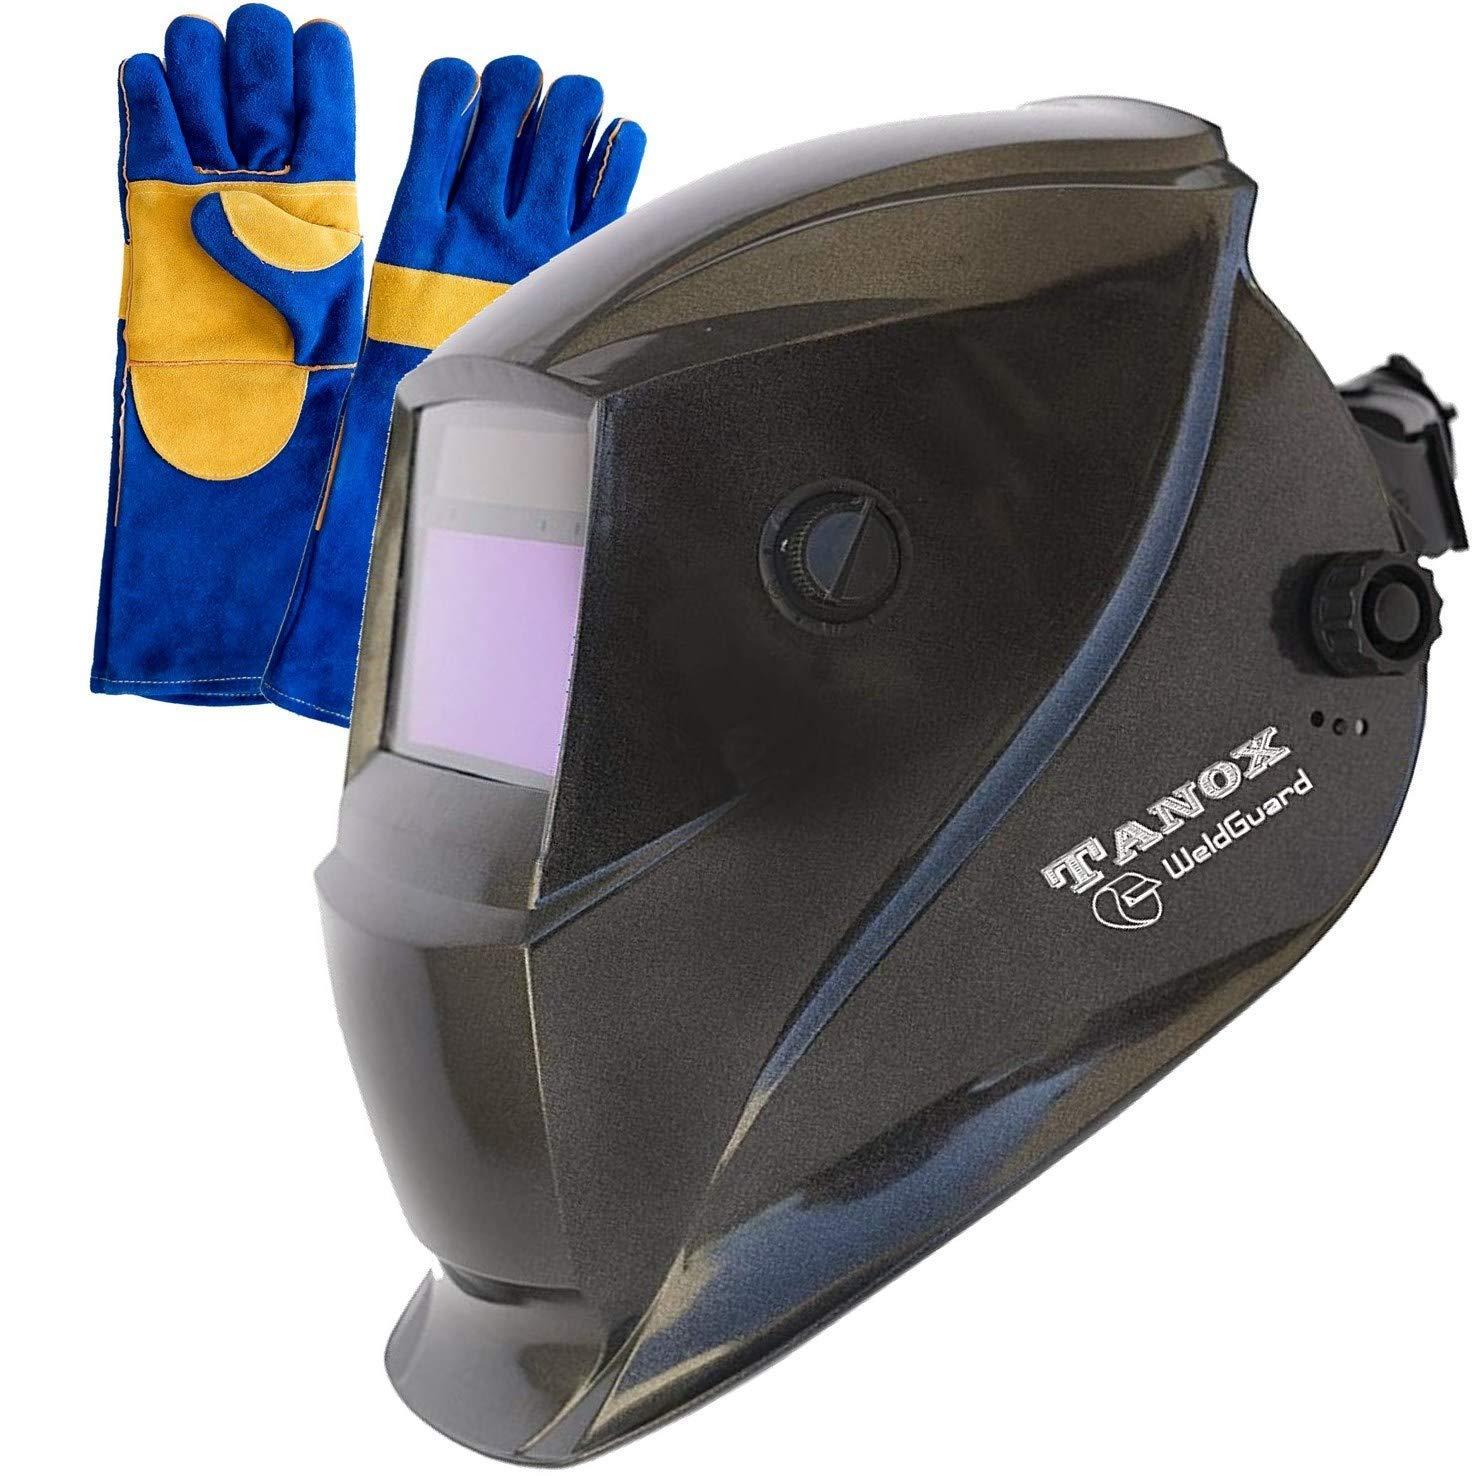 Tanox Auto Darkening Solar Powered Welding Helmet ADF-206S: Shade Lens, Tig Mig MMA, Adjustable Range 4/9-13, Grinding 0000, Plus 16 Inch Kevlar Fire Retardant Welding Gloves by Tanox